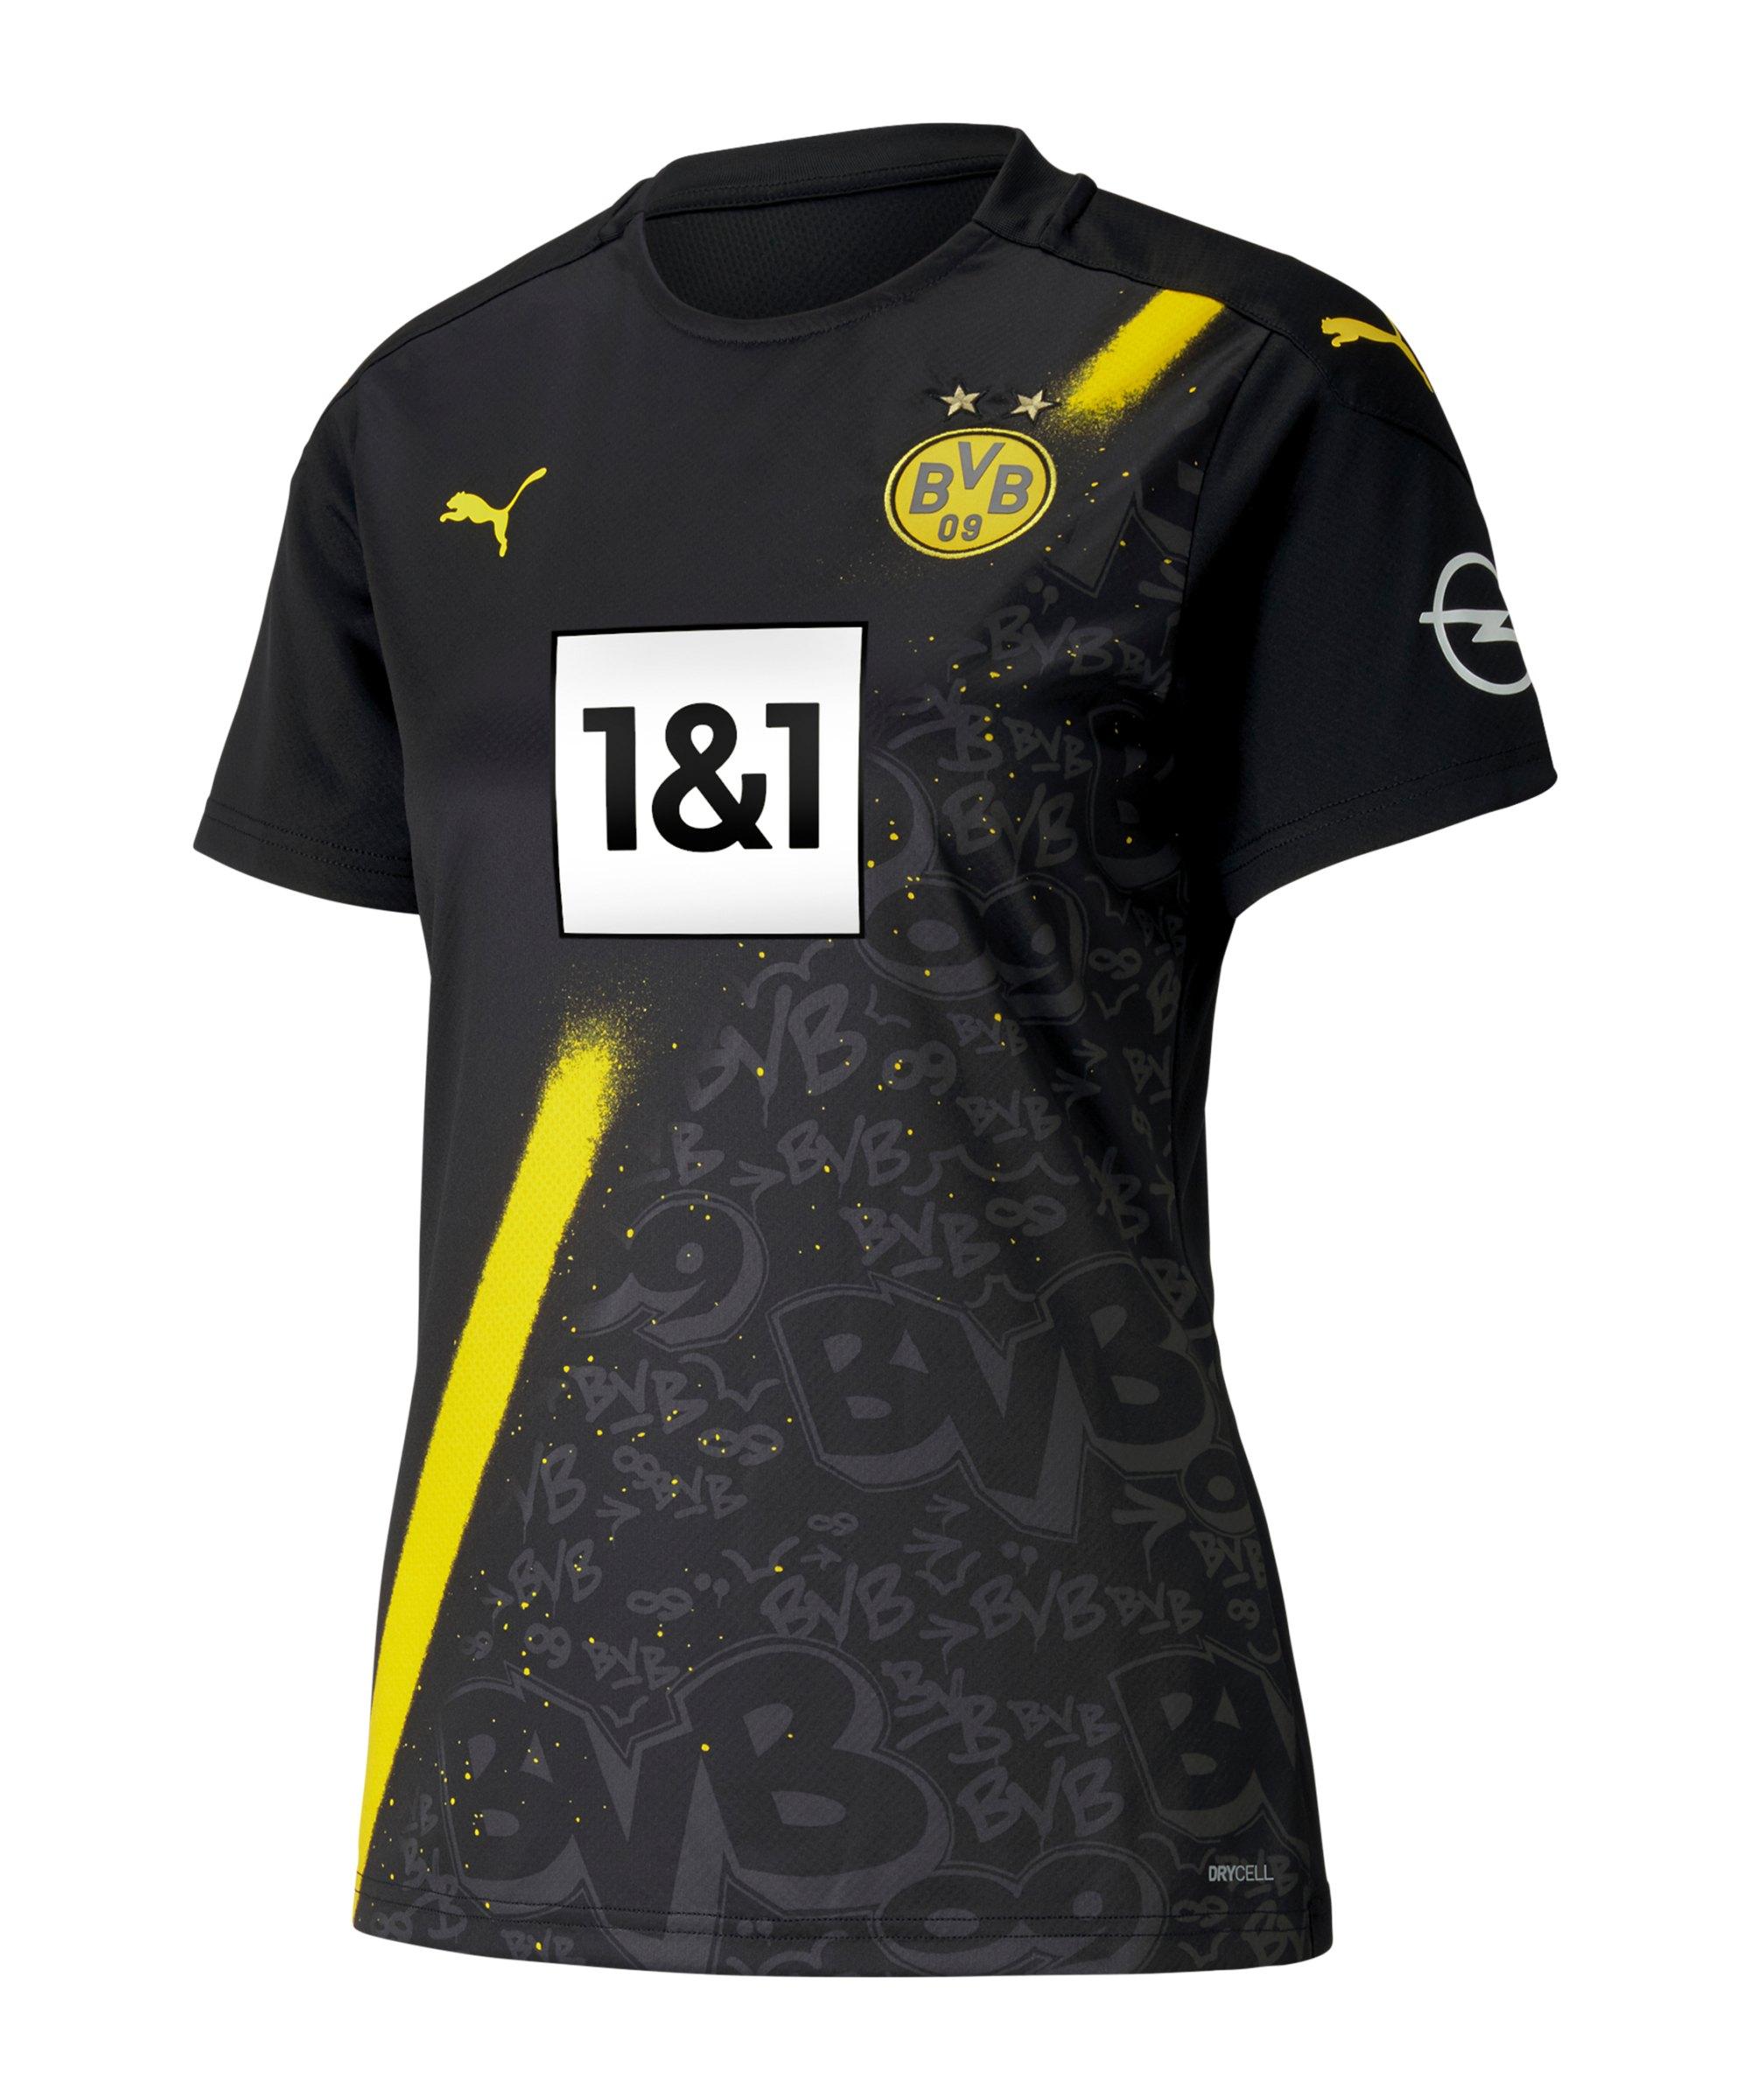 PUMA BVB Dortmund Trikot Away 2020/2021 Damen Schwarz F02 - schwarz